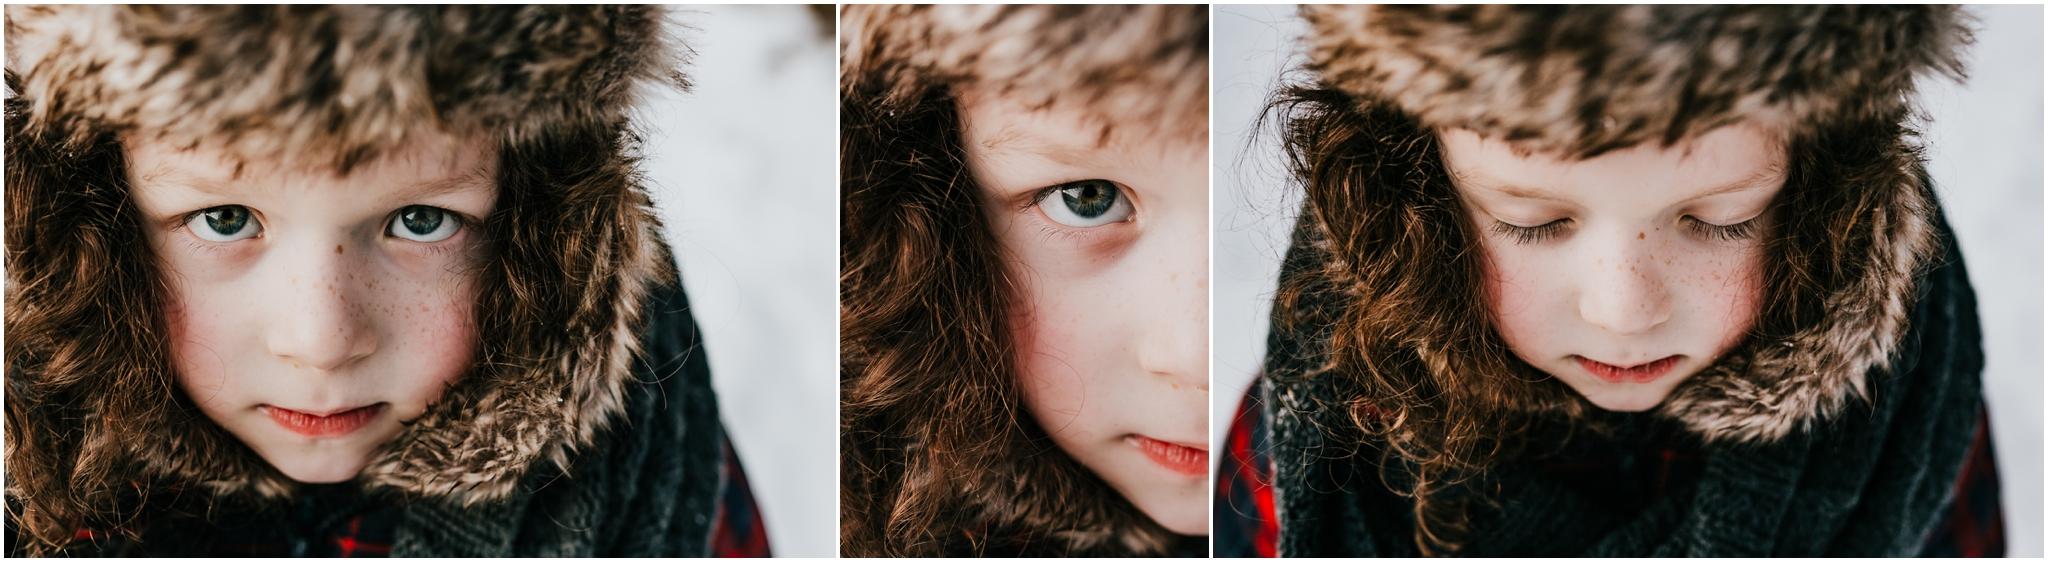 Edmonton Photographer - portrait photography - lifestyle photographer Edmonton Alberta Canada - Winter portraits